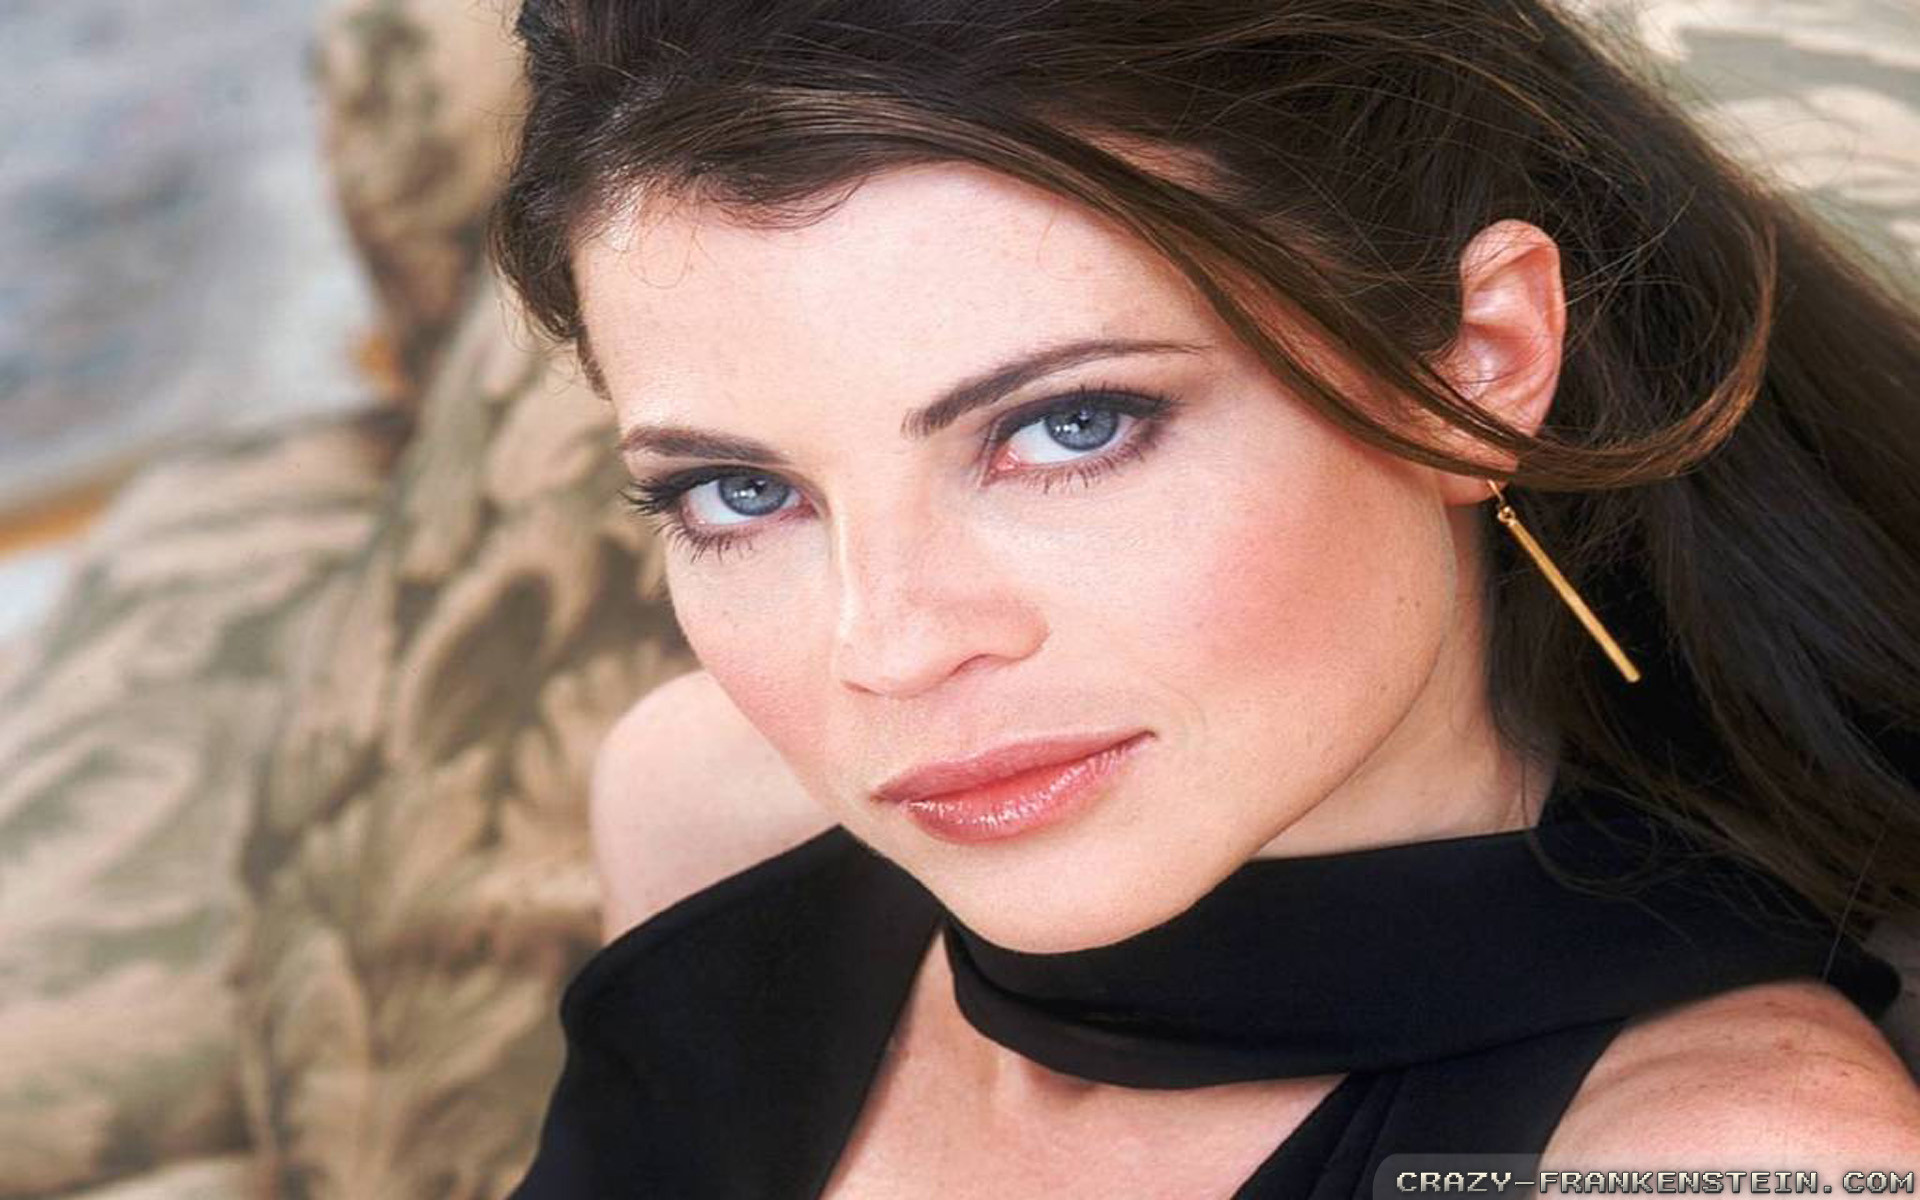 Wallpaper: Yasmine Bleeth pretty face. Resolution: 1024×768 | 1280×1024 |  1600×1200. Widescreen Res: 1440×900 | 1680×1050 | 1920×1200